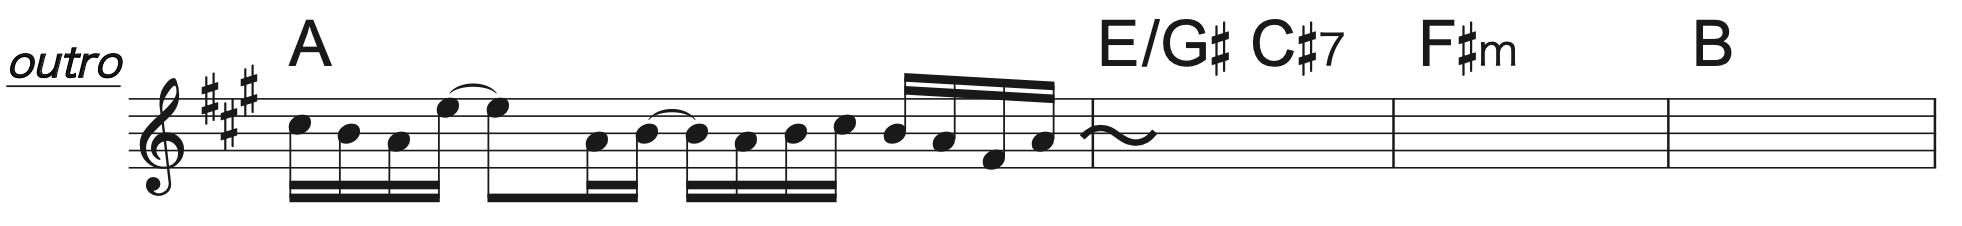 Pretender Aコード楽譜(半音上げ)3